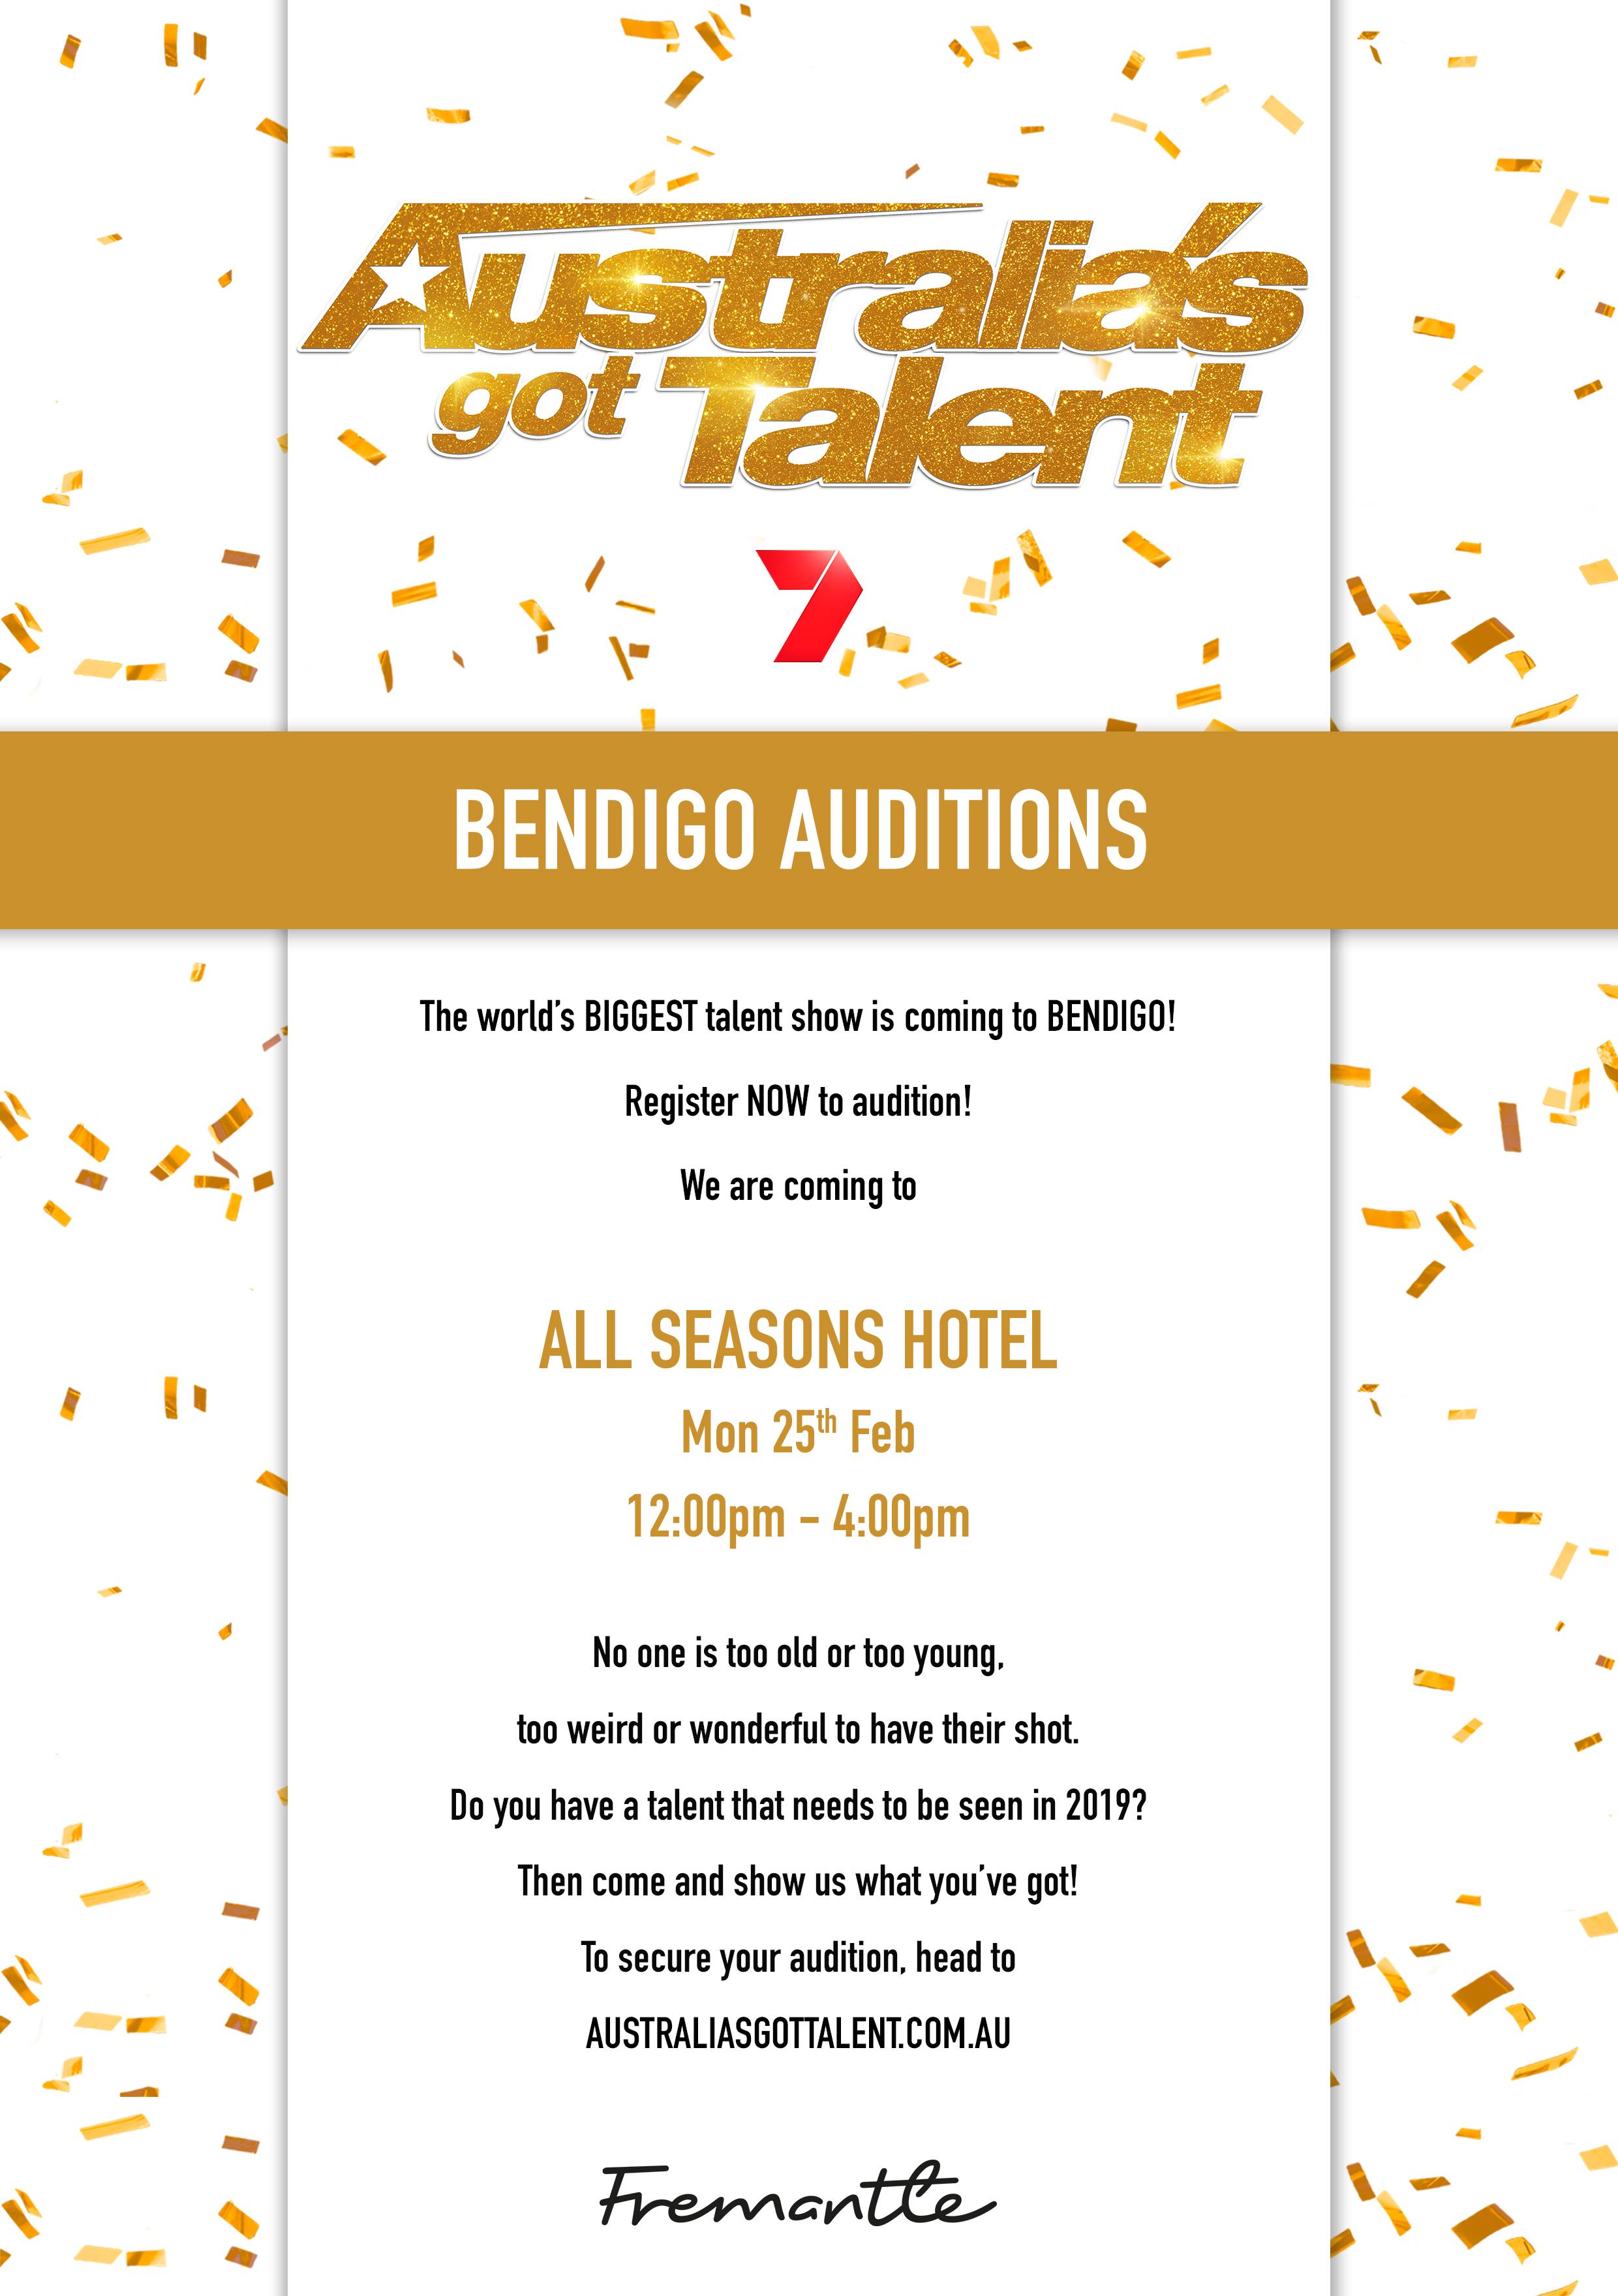 AGT_Bendigo_Audition Flyer.jpg